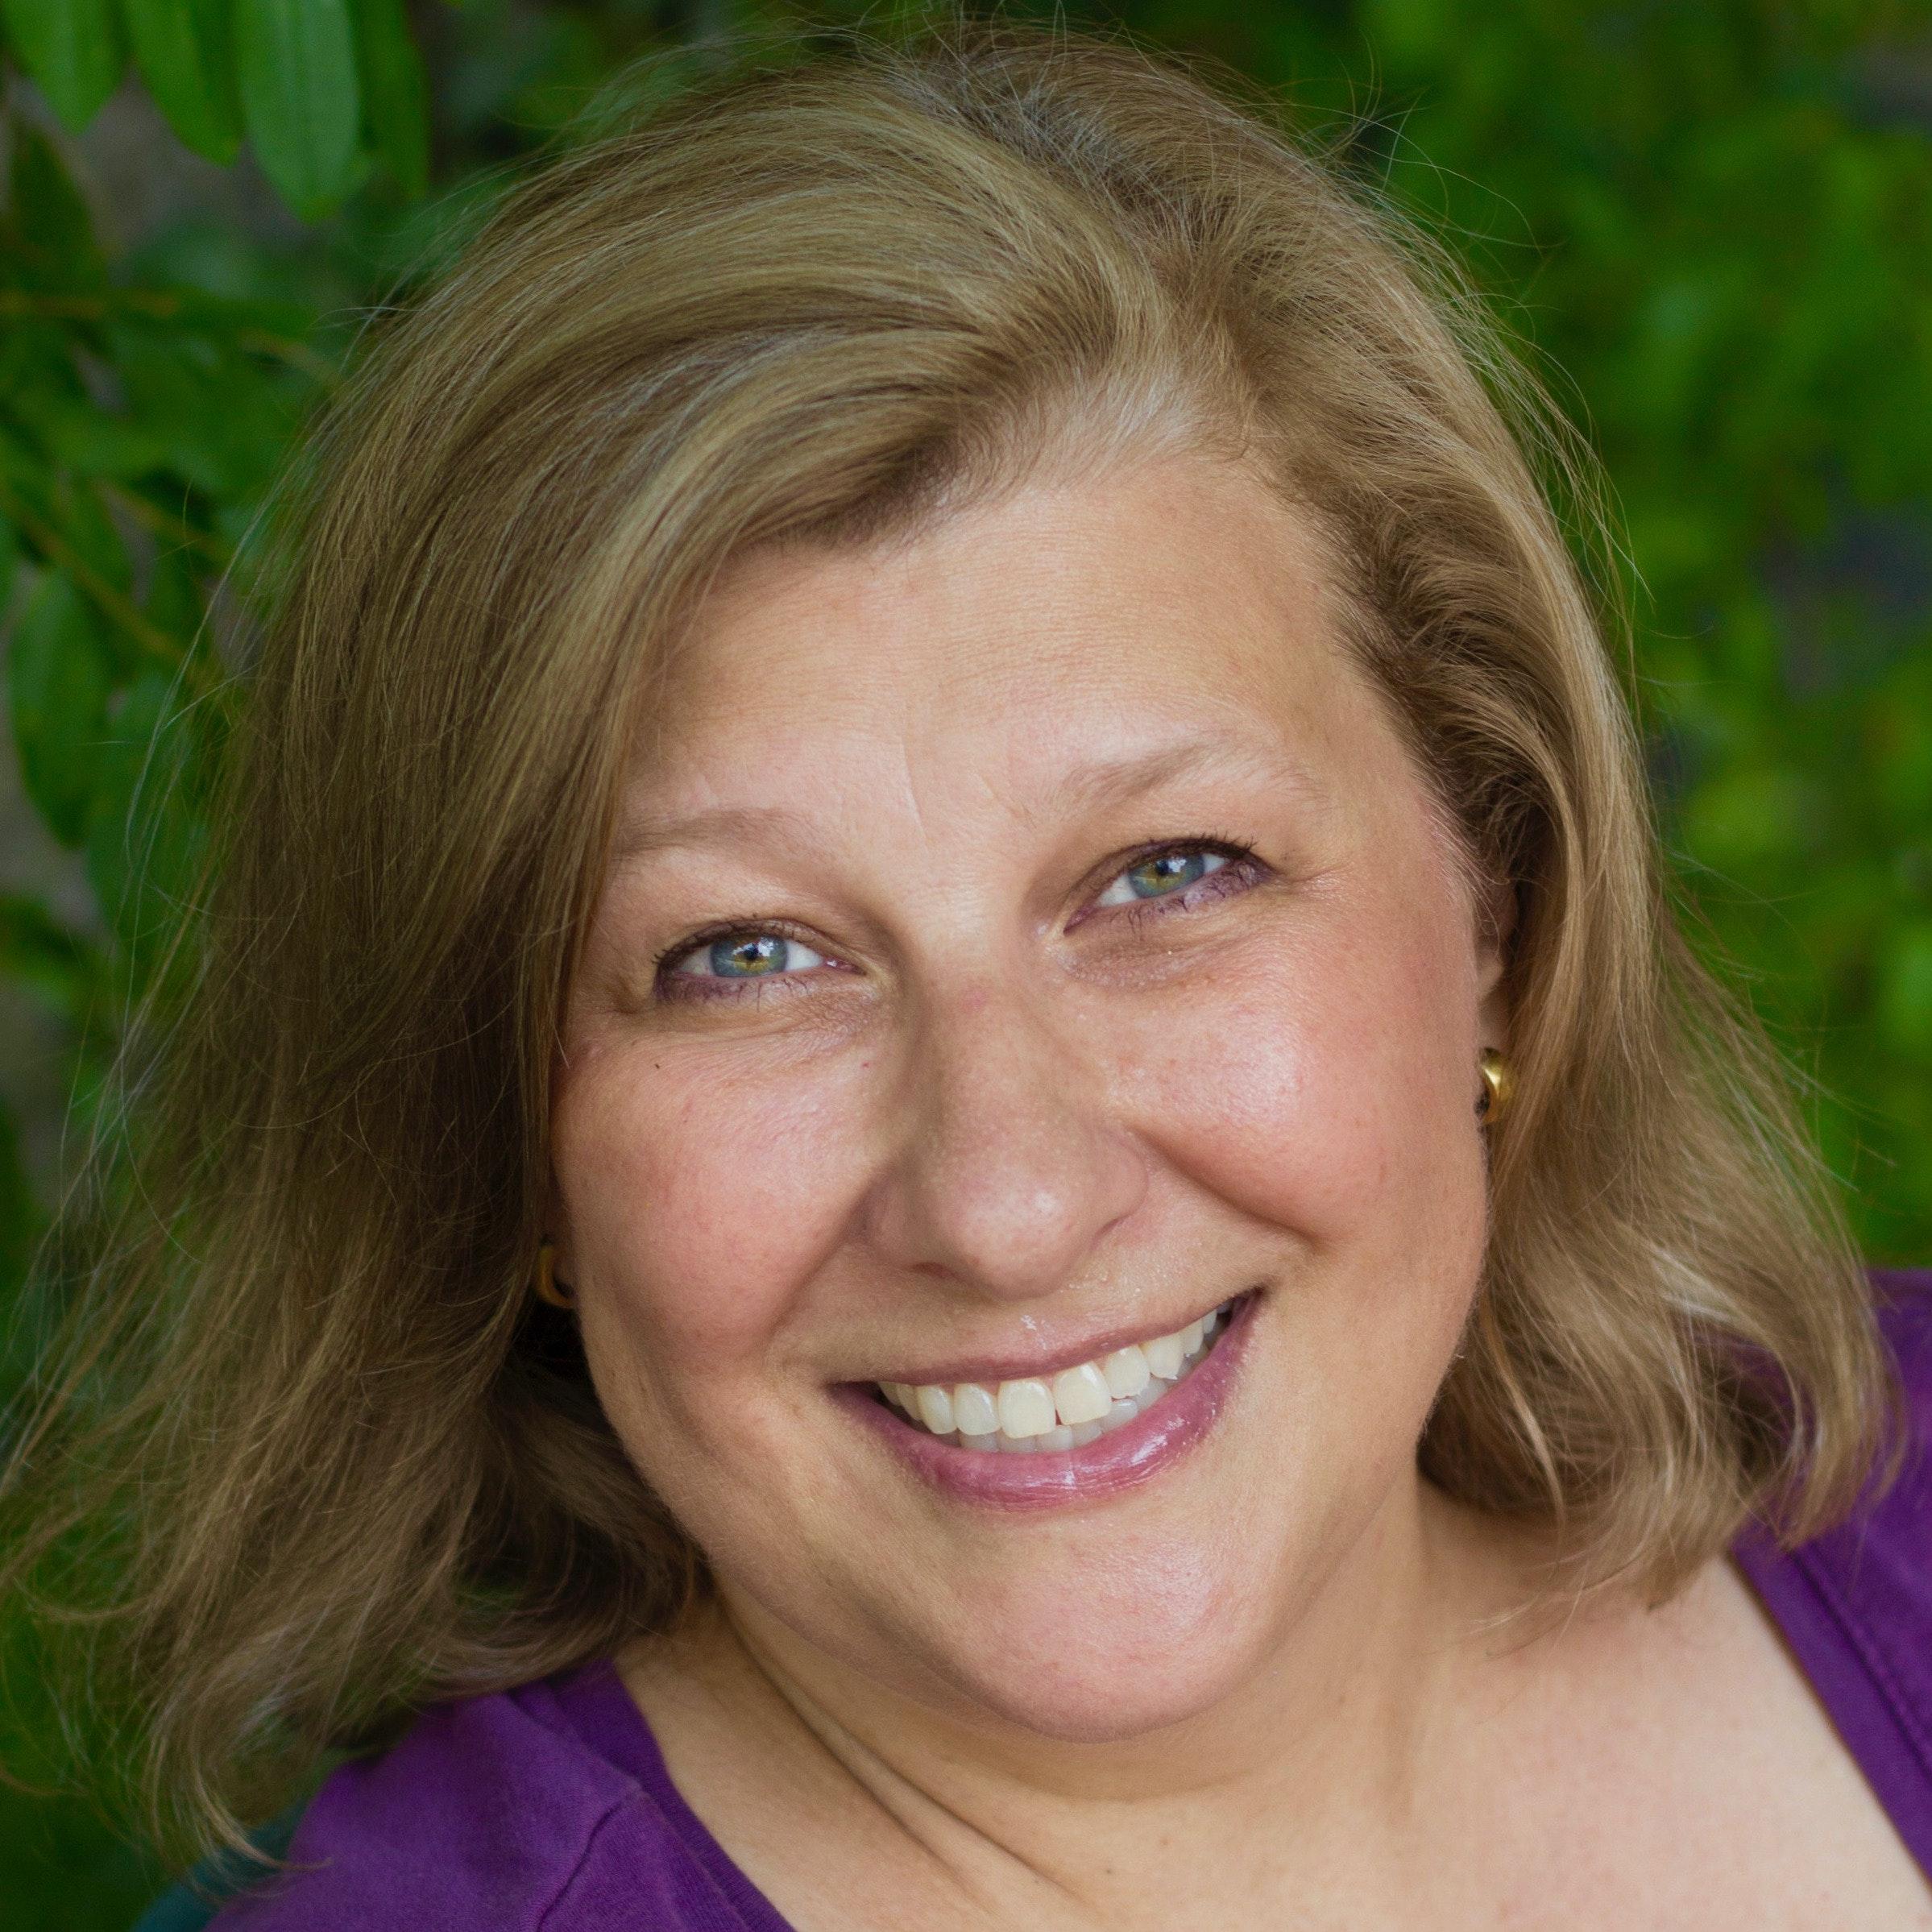 Julie U.